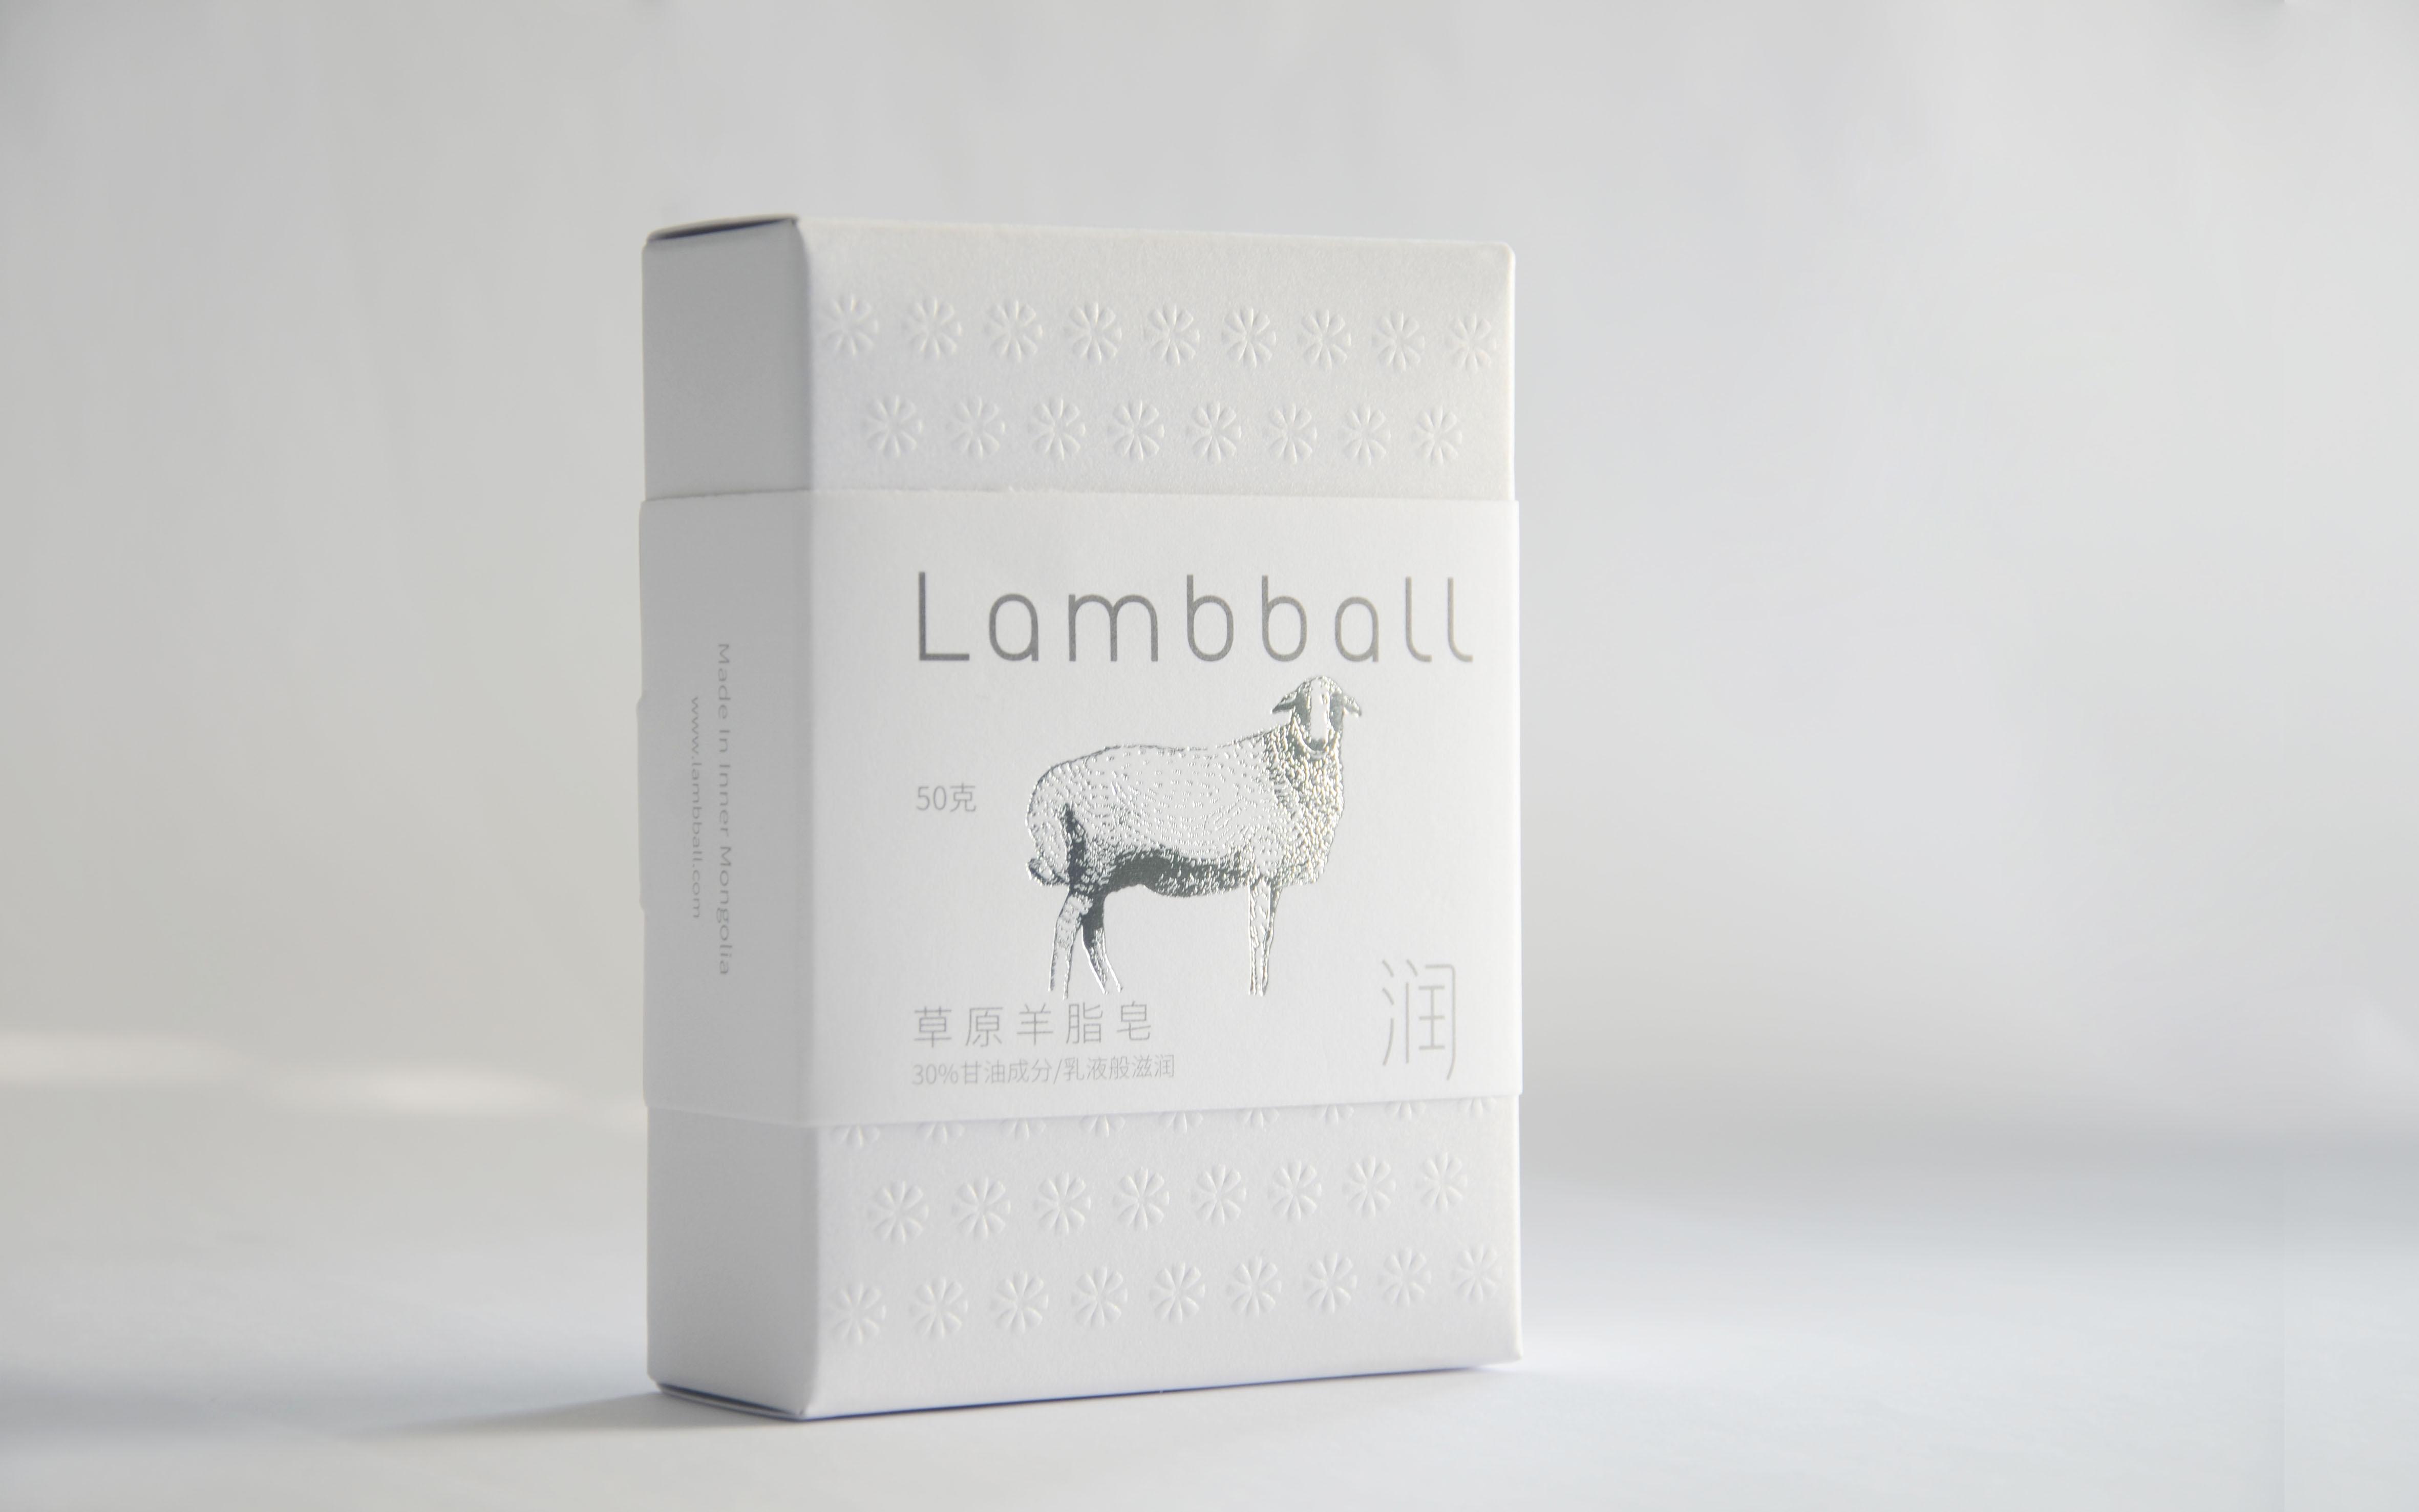 lambball羊脂皂包装设计 第15张 lambball羊脂皂包装设计 蒙古设计